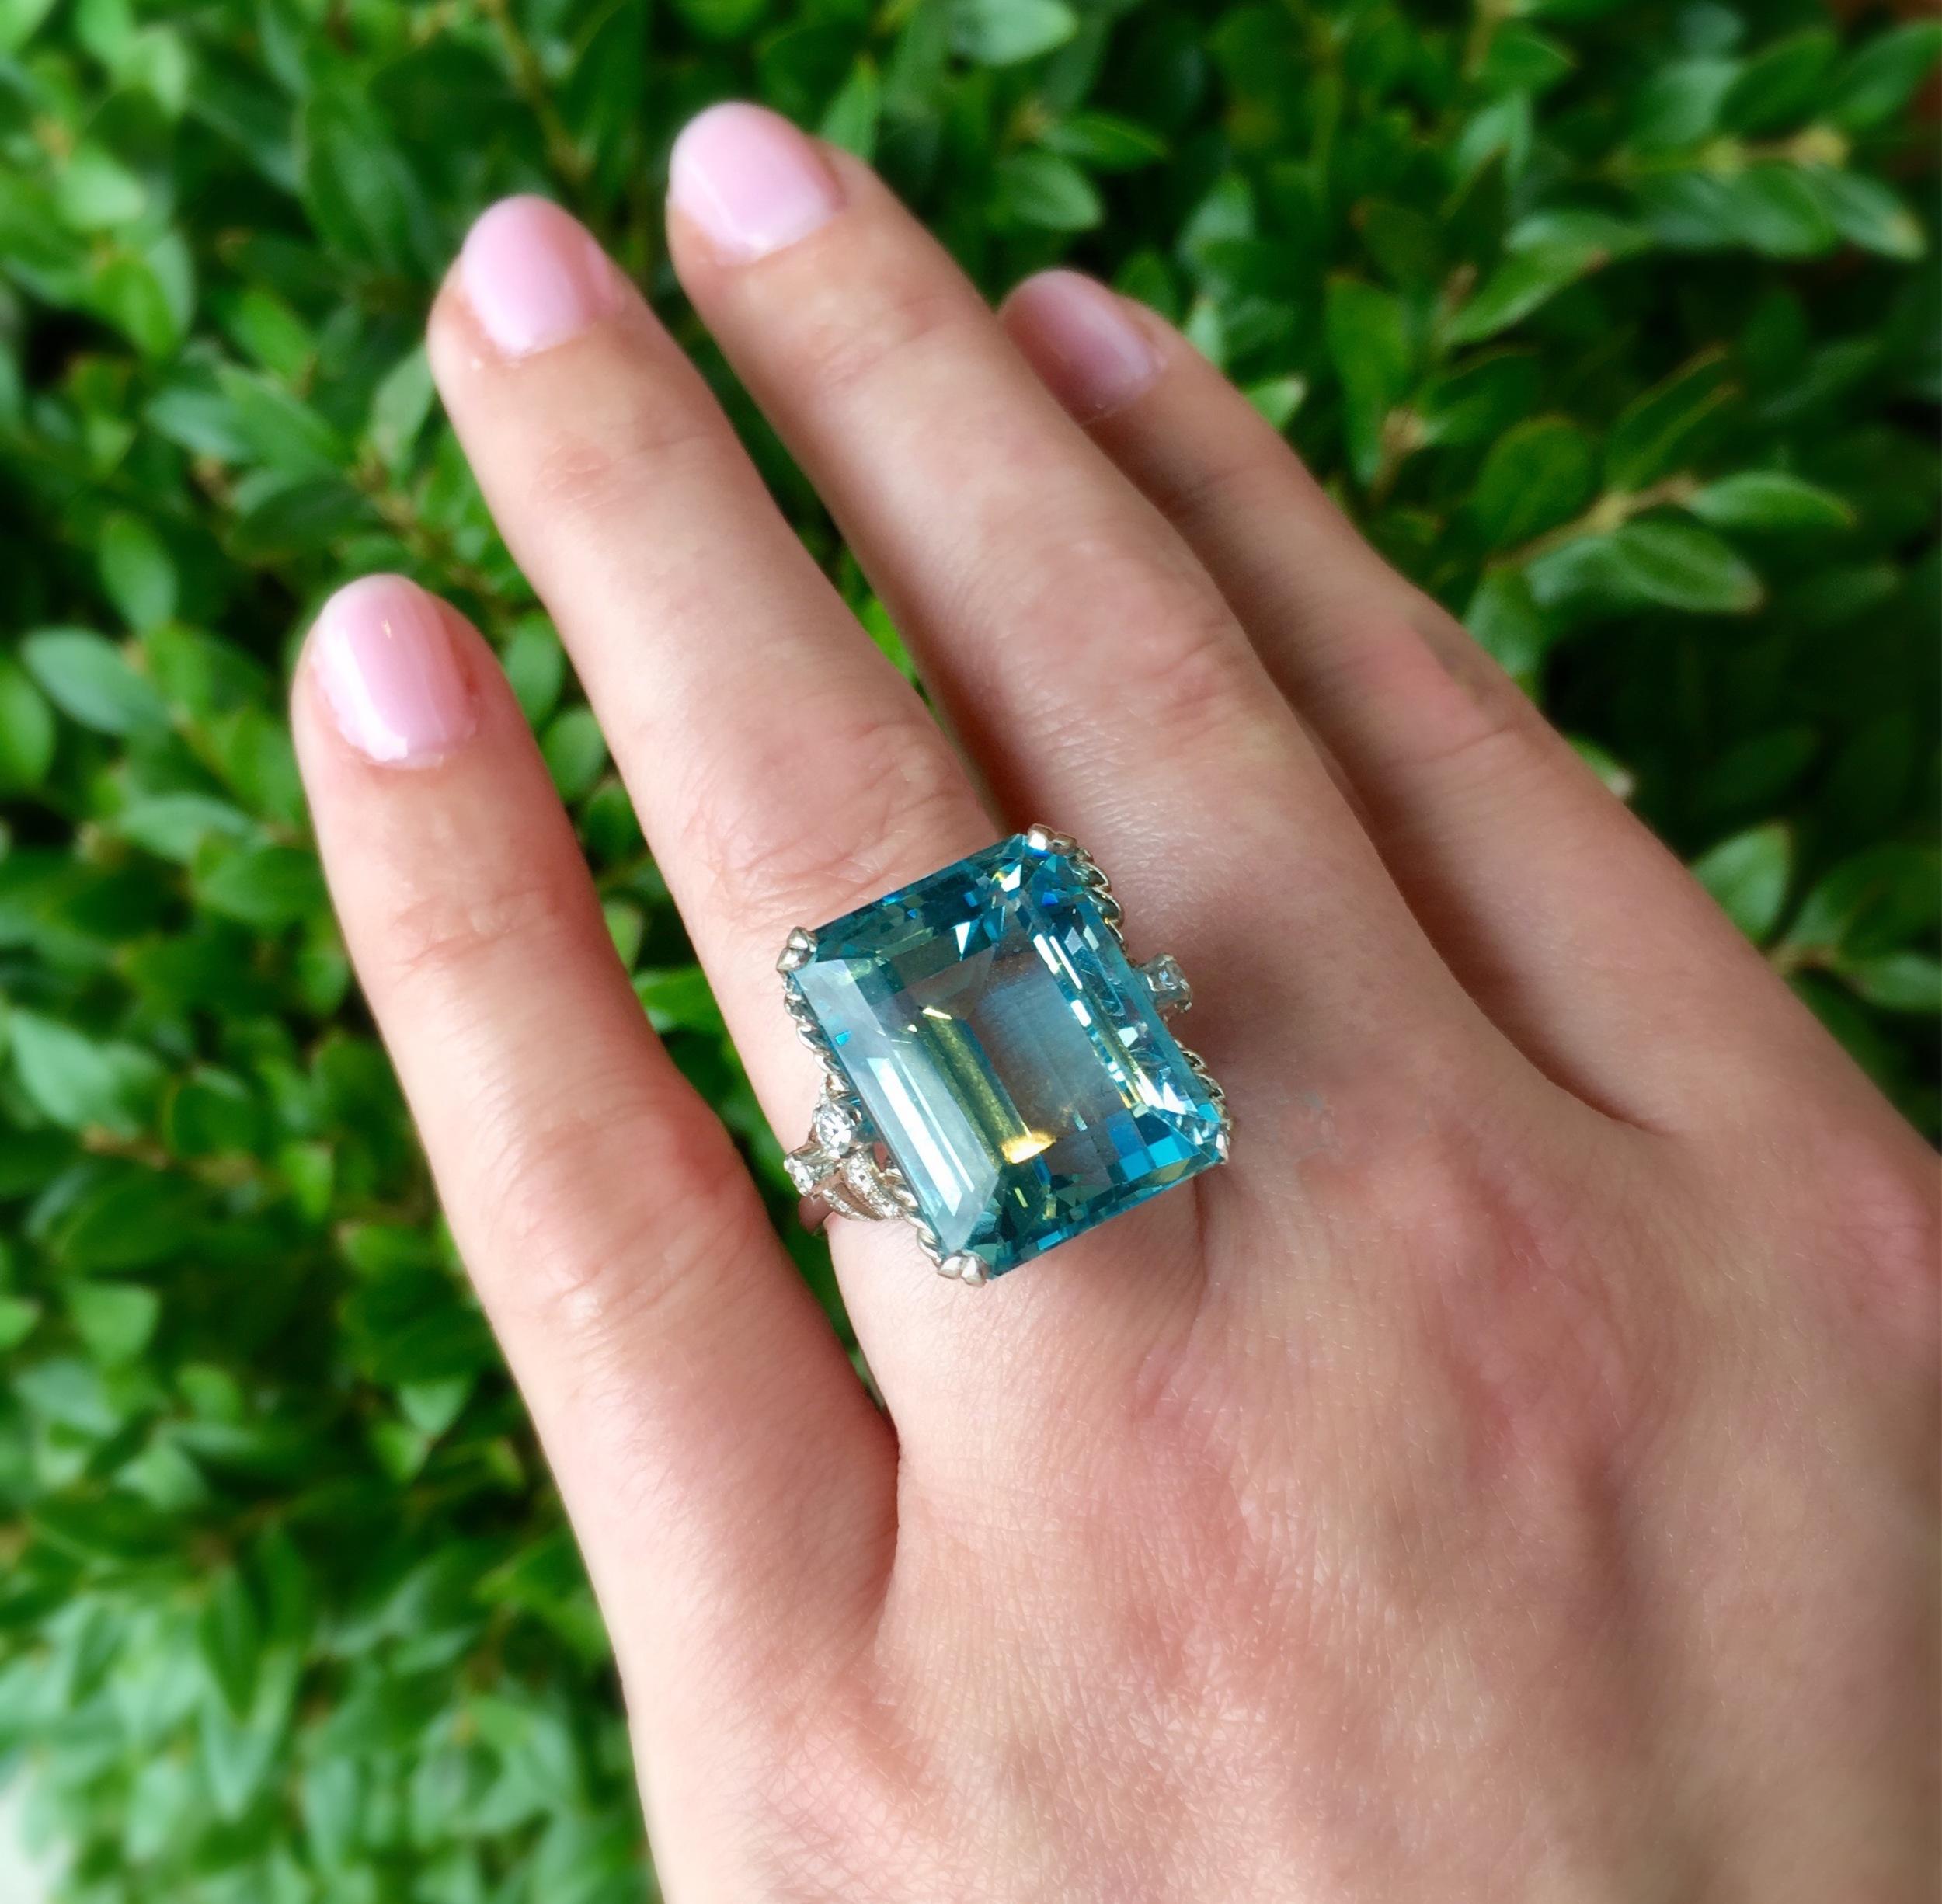 SOLD - Jaw dropping 23+ carat aquamarine, diamond and platinum ring.